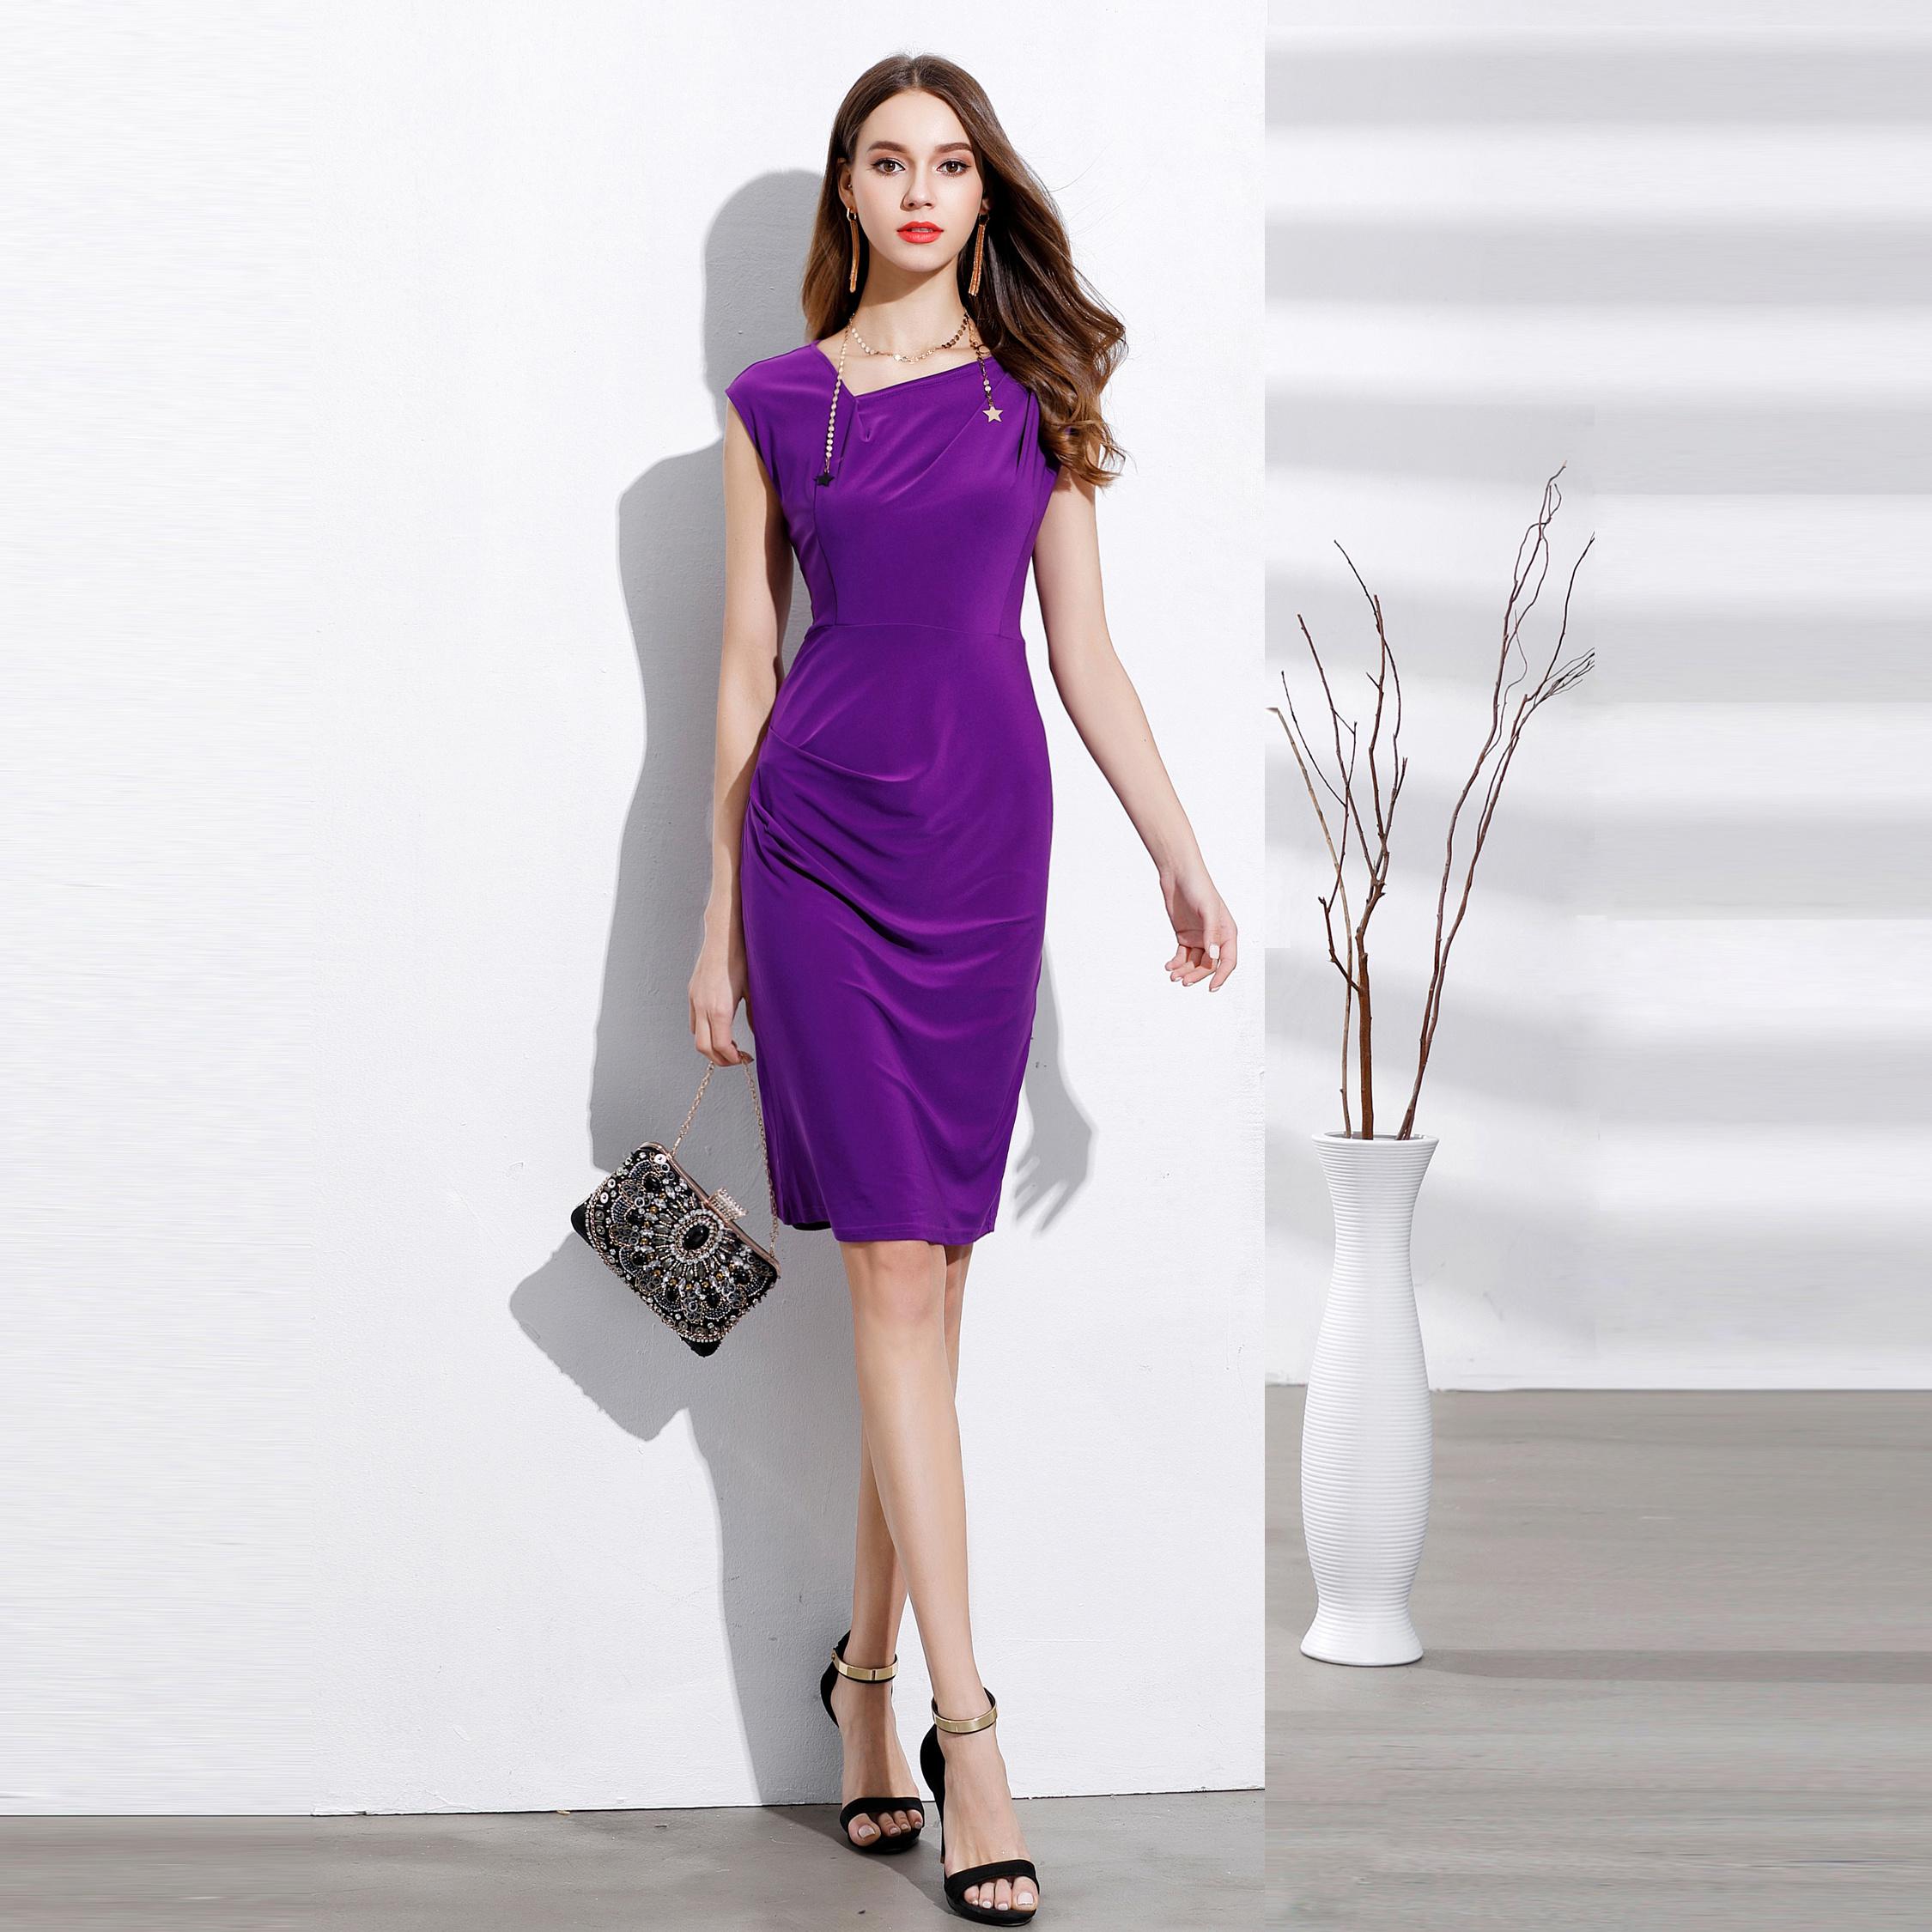 RL品牌女装设计感OL通勤包肩斜领抽褶修身显瘦印花连衣裙大码C384